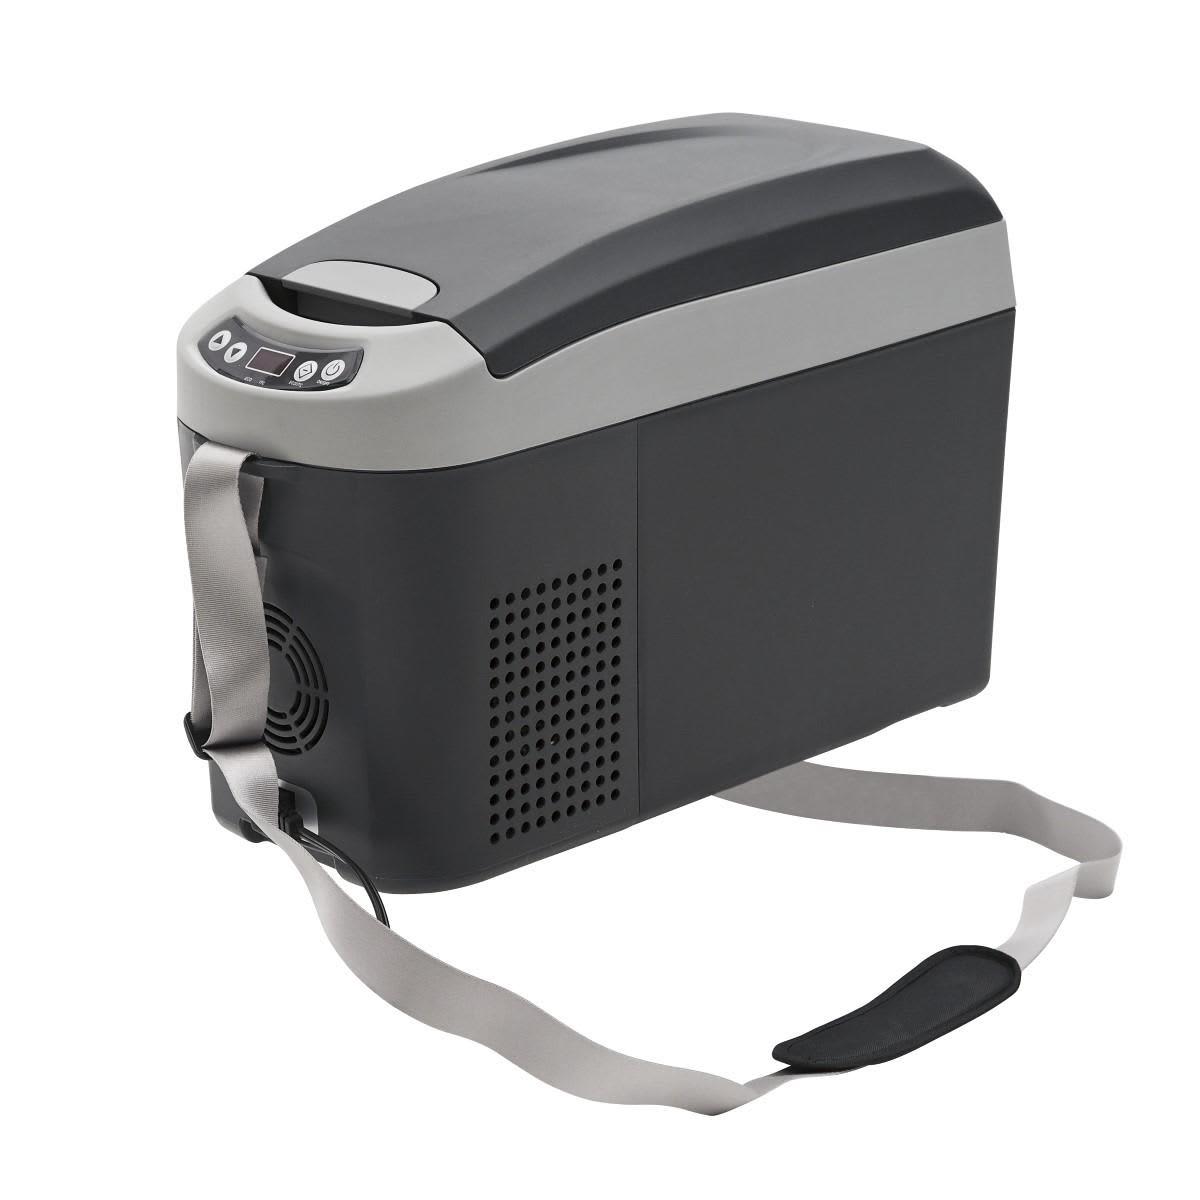 Indel B TB15 Portable Compressor Refrigerator